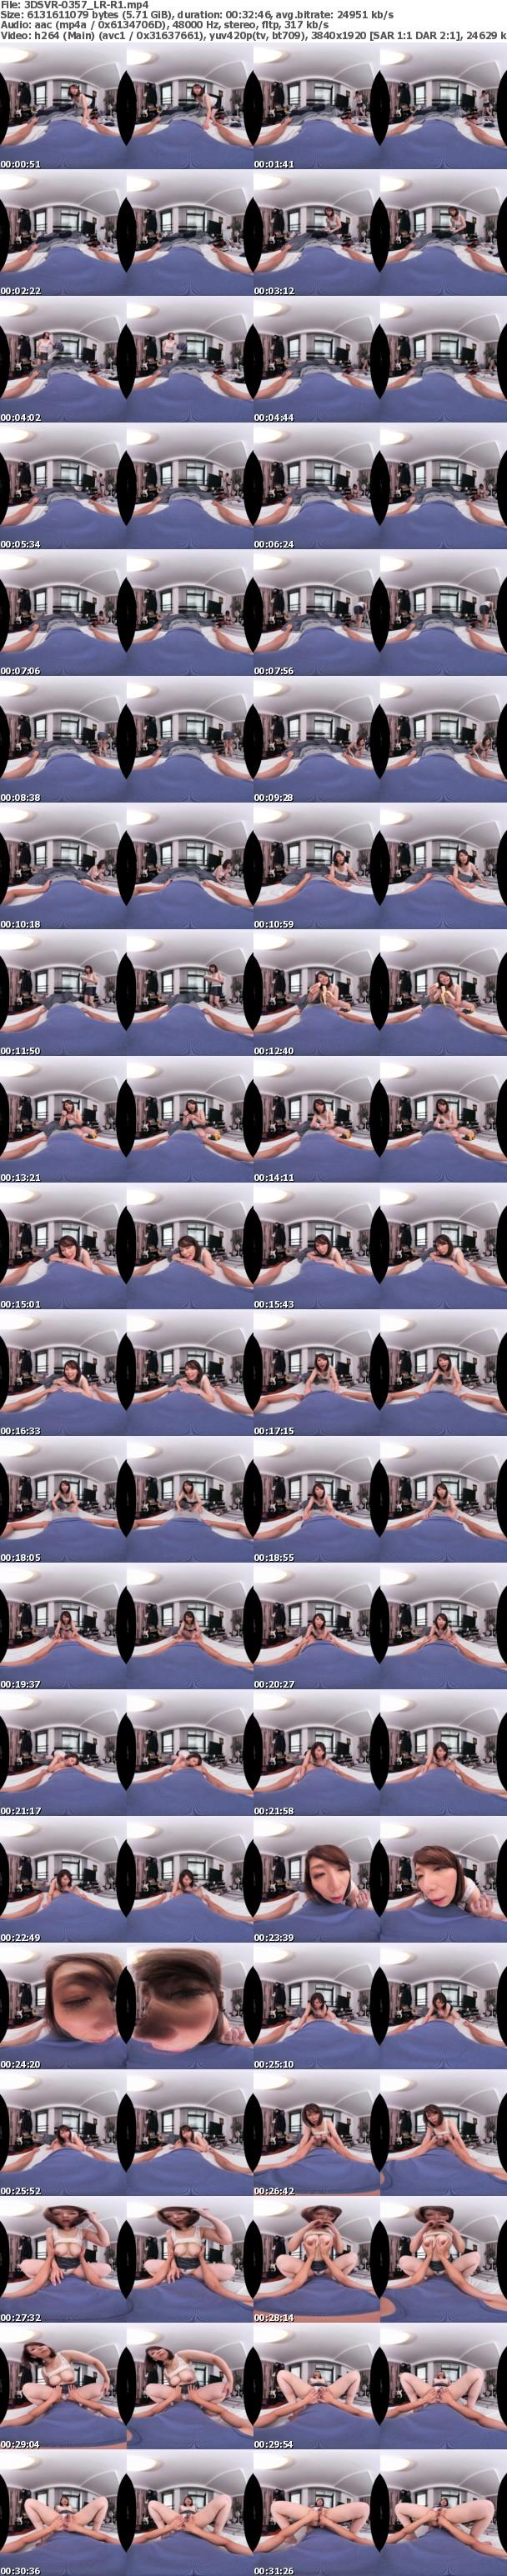 VR/3D 3DSVR-0357 【超高画質版】母フェチVR 翔田千里【うちのお袋があまりにも豊満でムチムチしてるので、朝採れザーメンをごっくんしてもらい、膣内射精までしてしまった…】